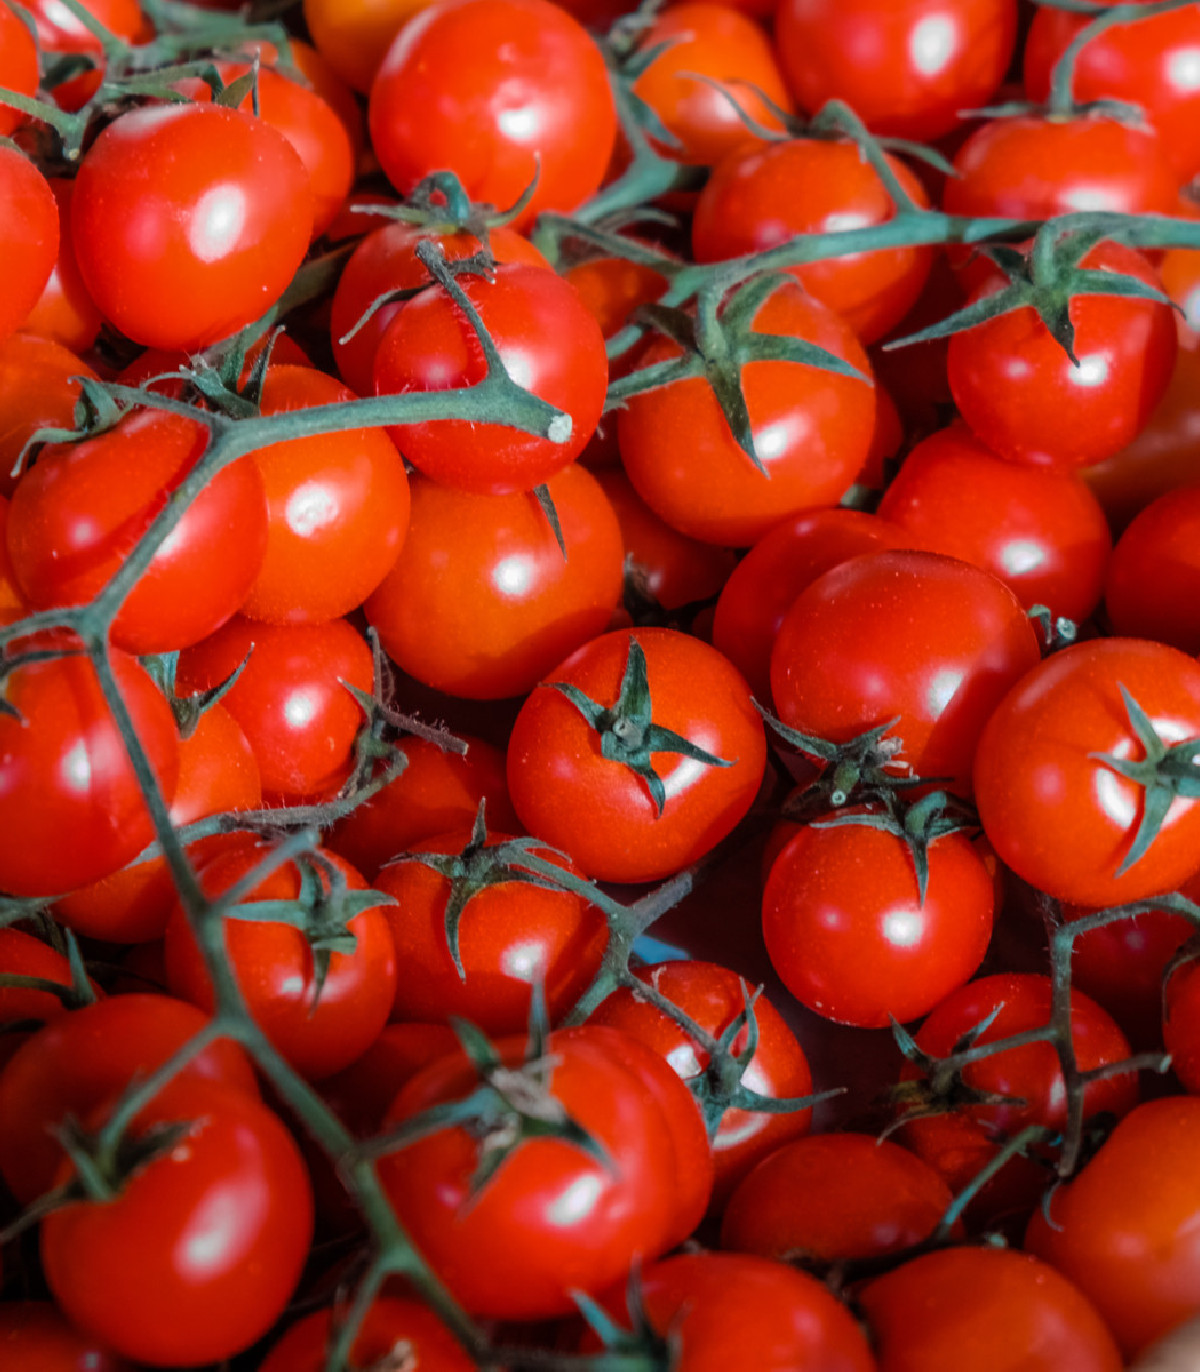 Paradajka Cherolla F1 kolíková - semená rajčiaka - semiačka - 5 ks